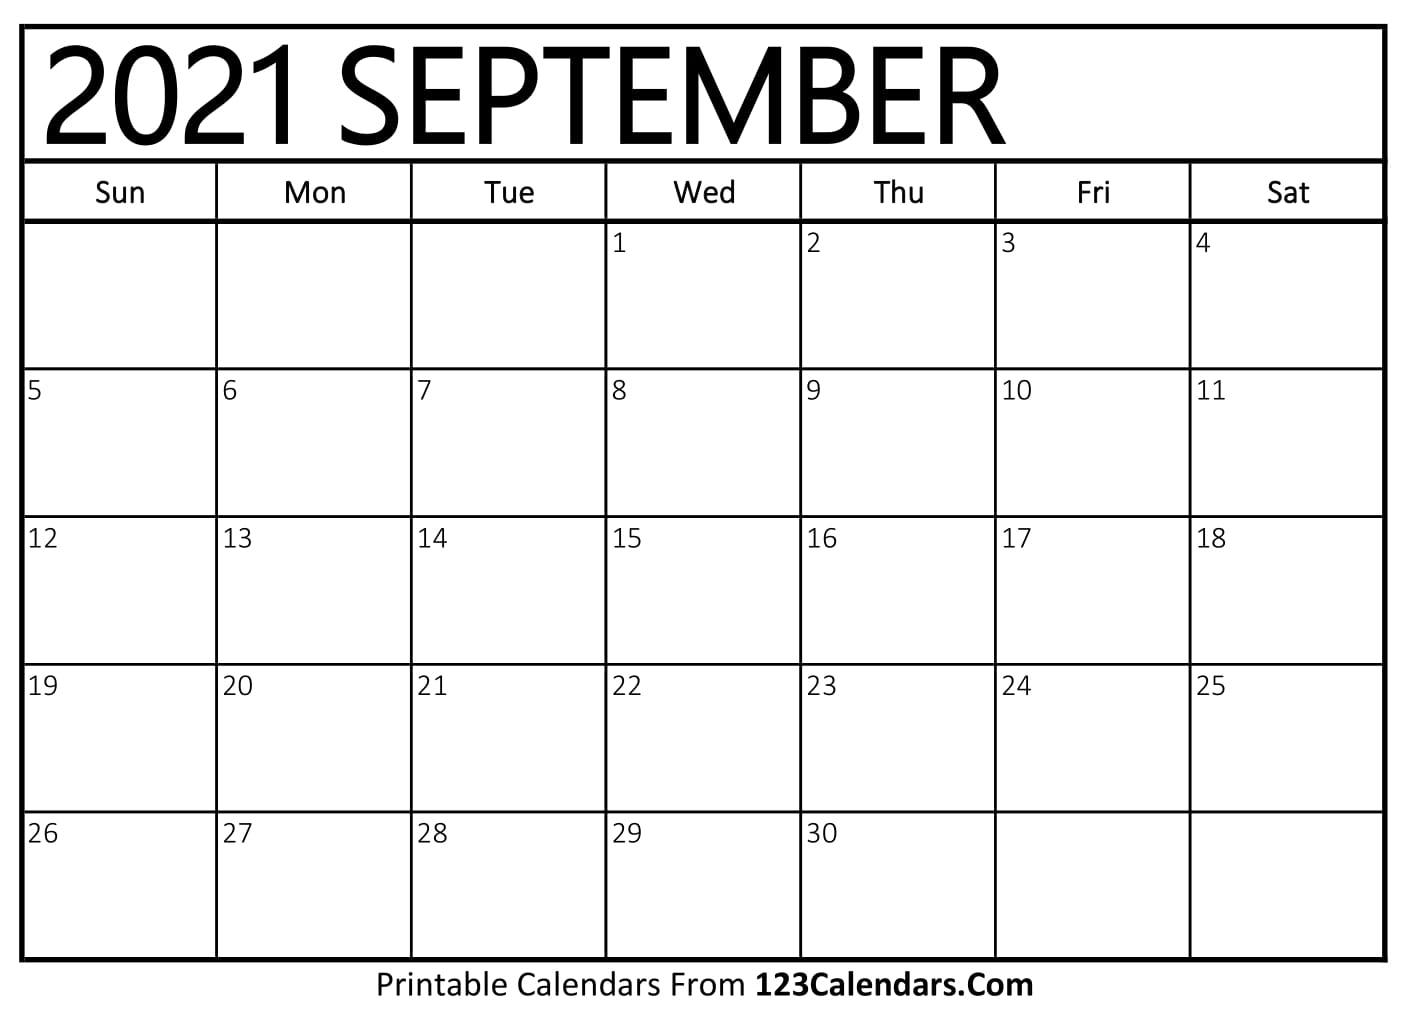 Printable September 2021 Calendar Templates   123Calendars